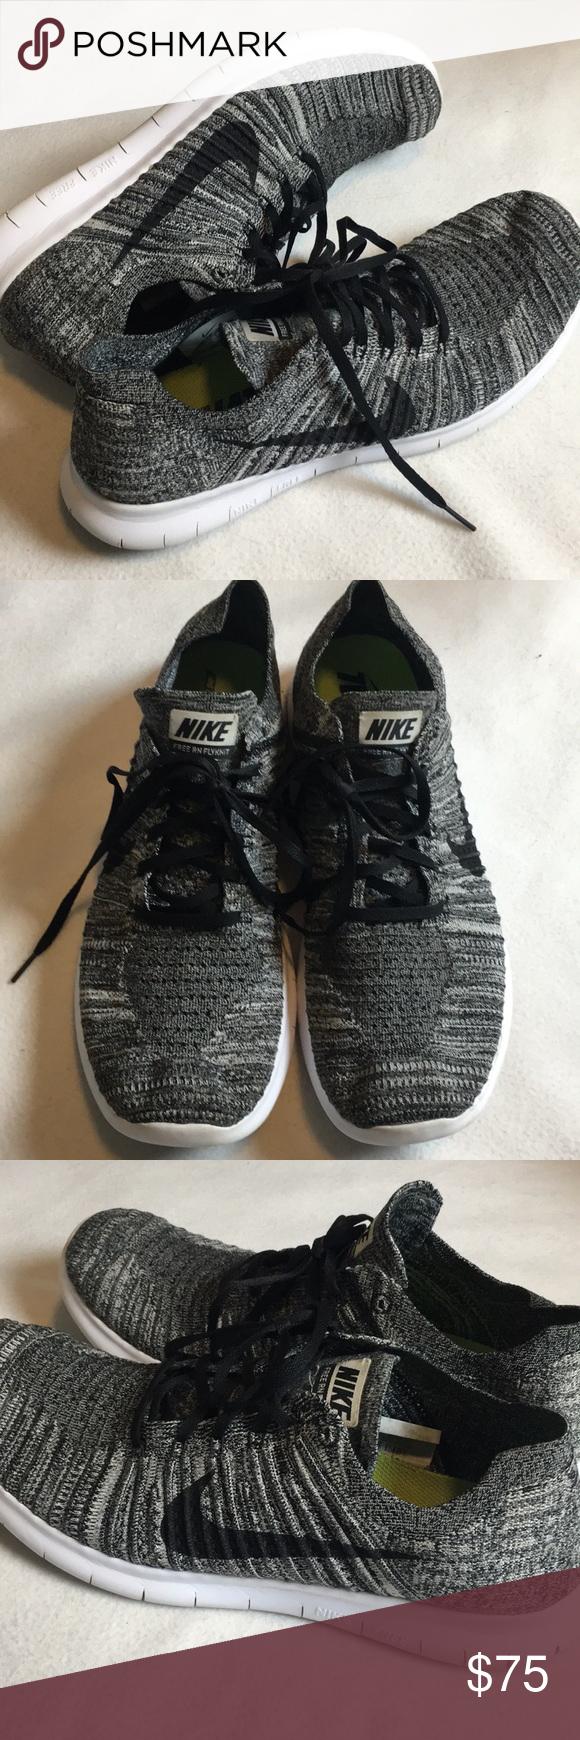 Nike Free RN Flyknit. Black and white. Black check black laces White soles.  Size 13 Men's .